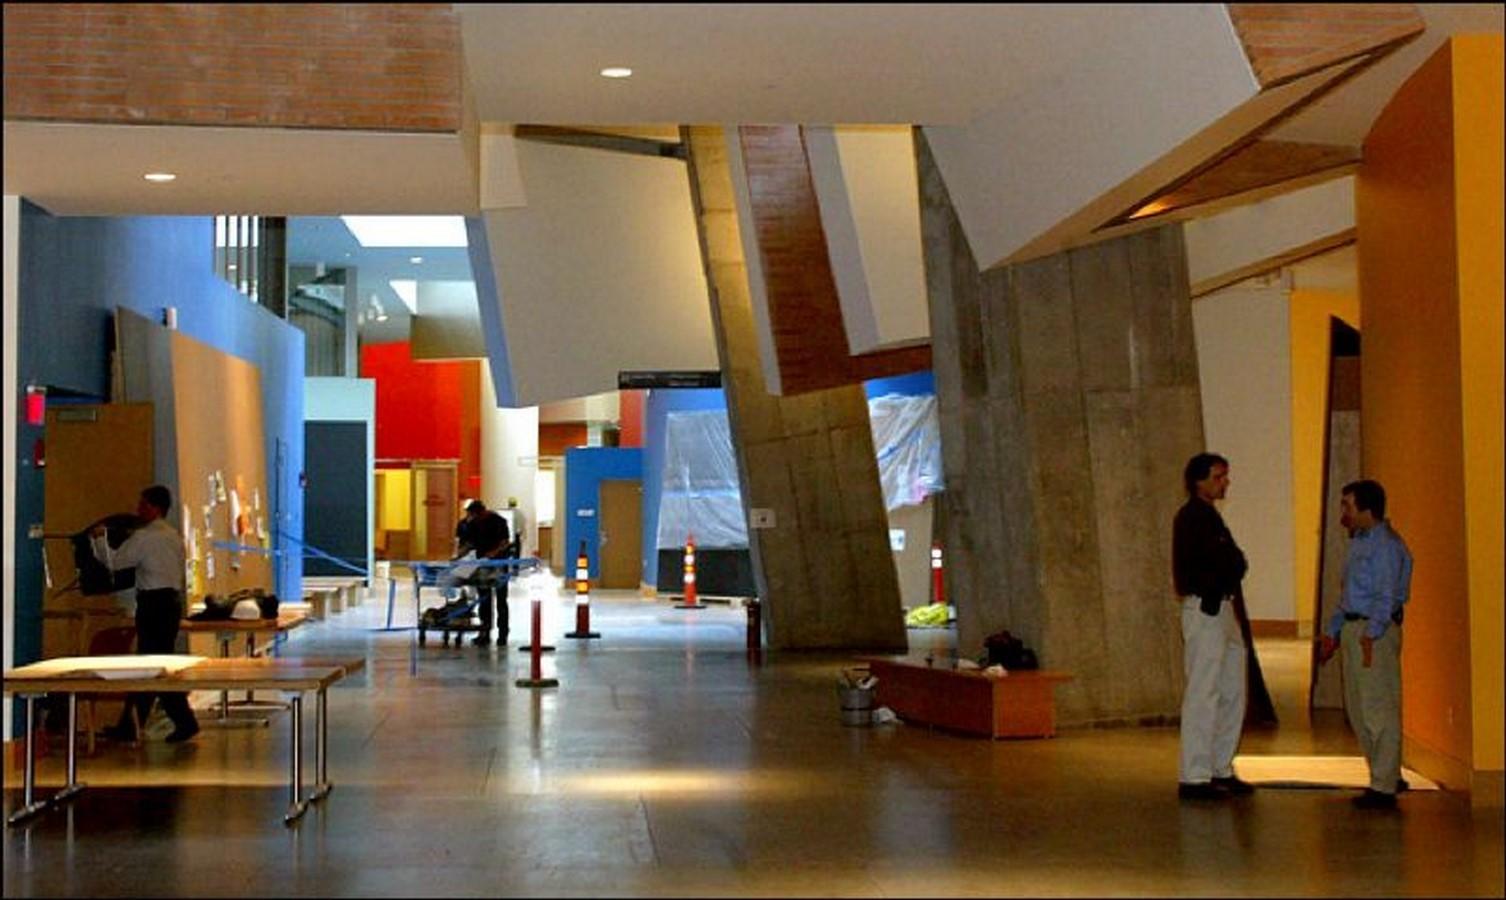 Stata Center (Cambridge, Massachusetts) - Sheet2